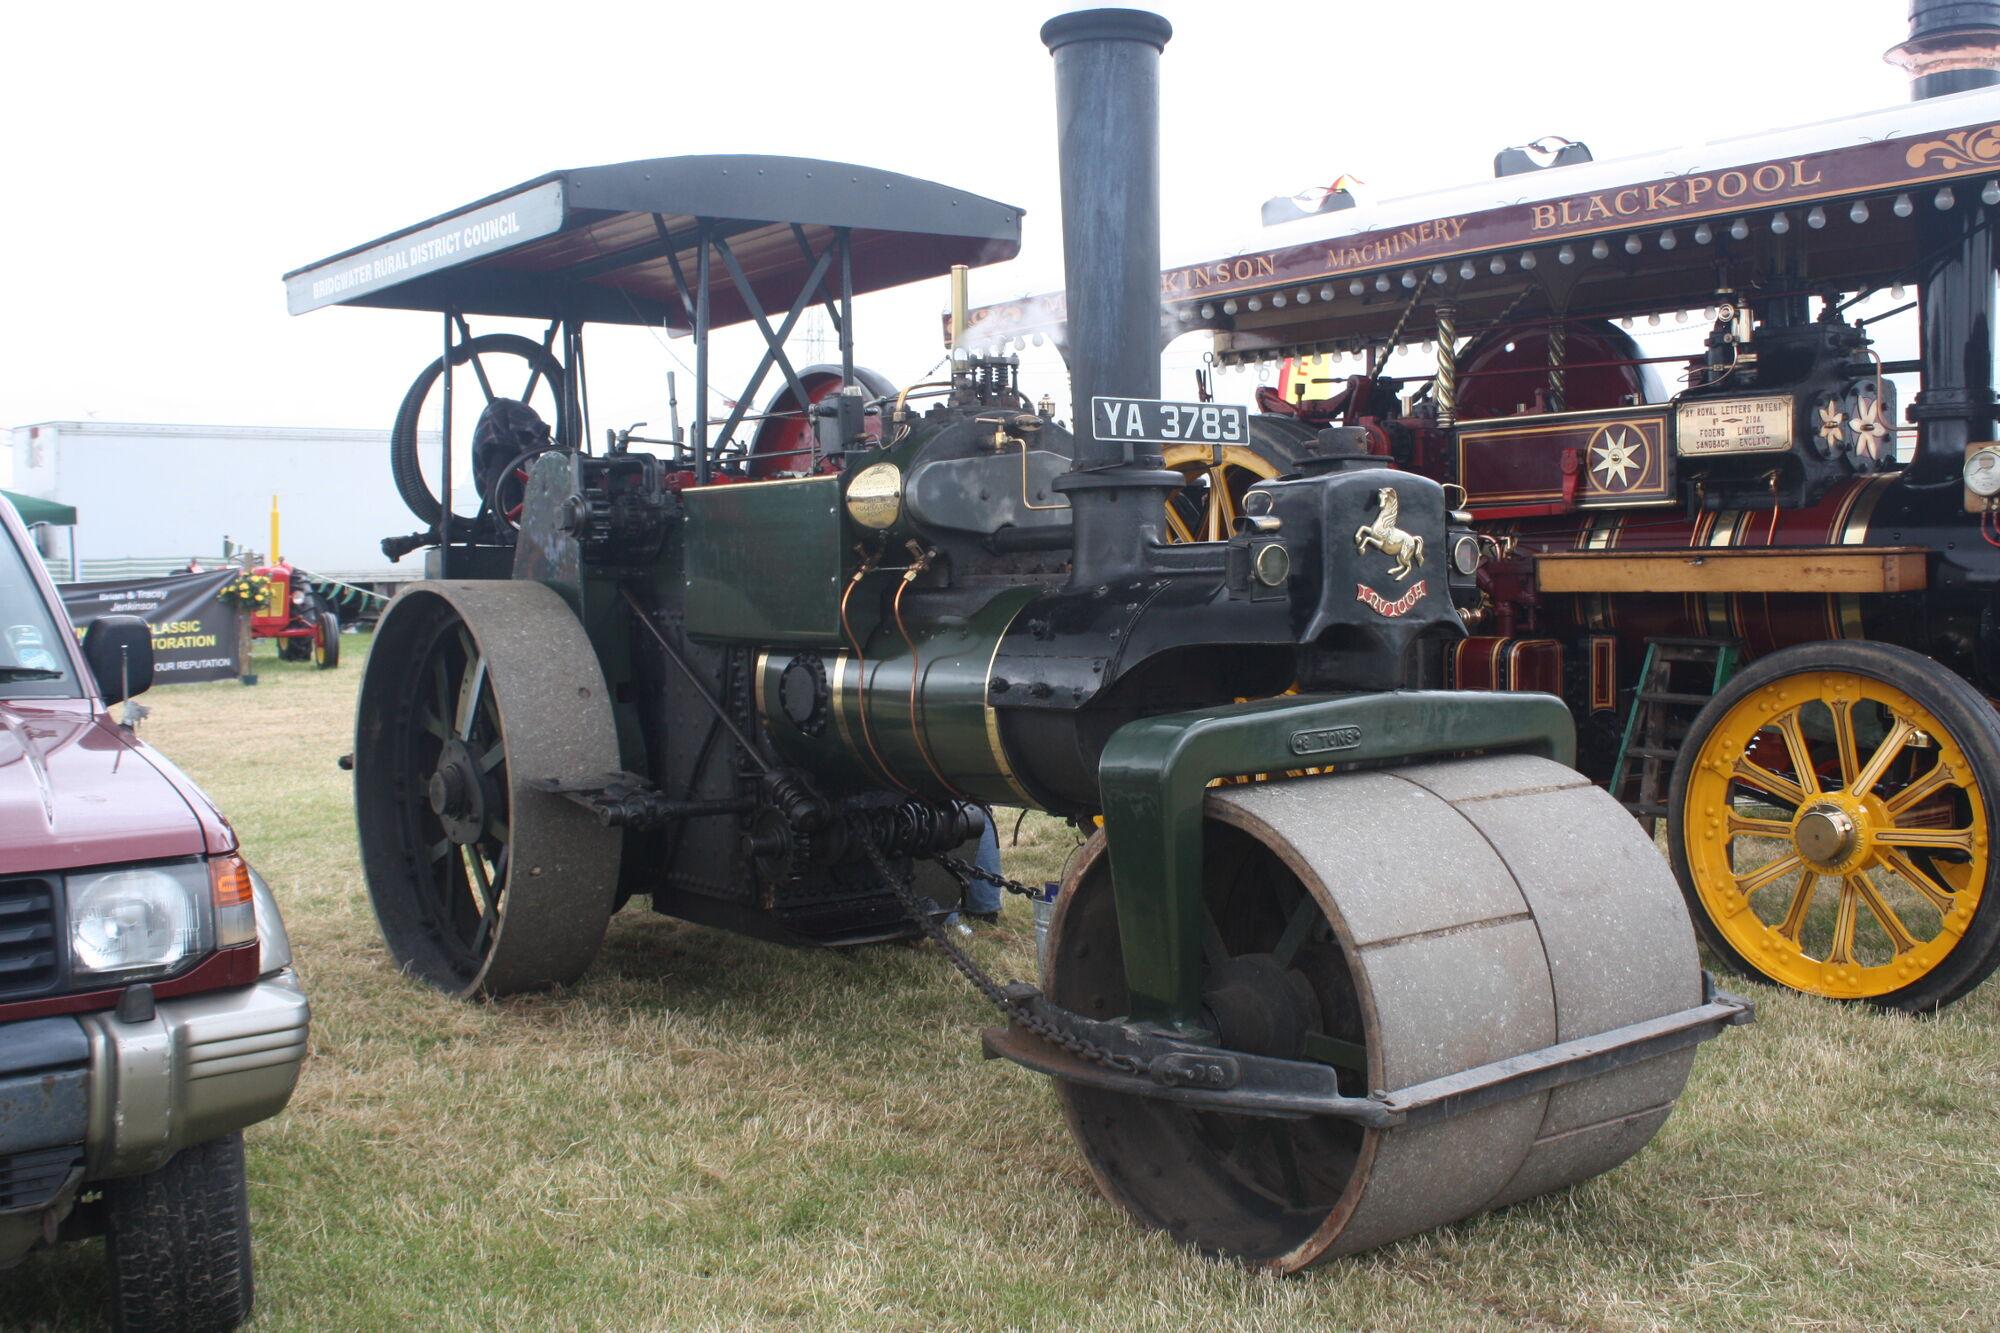 Aveling porter no 10072 tractor construction plant wiki fandom powered by wikia - Porter international wiki ...